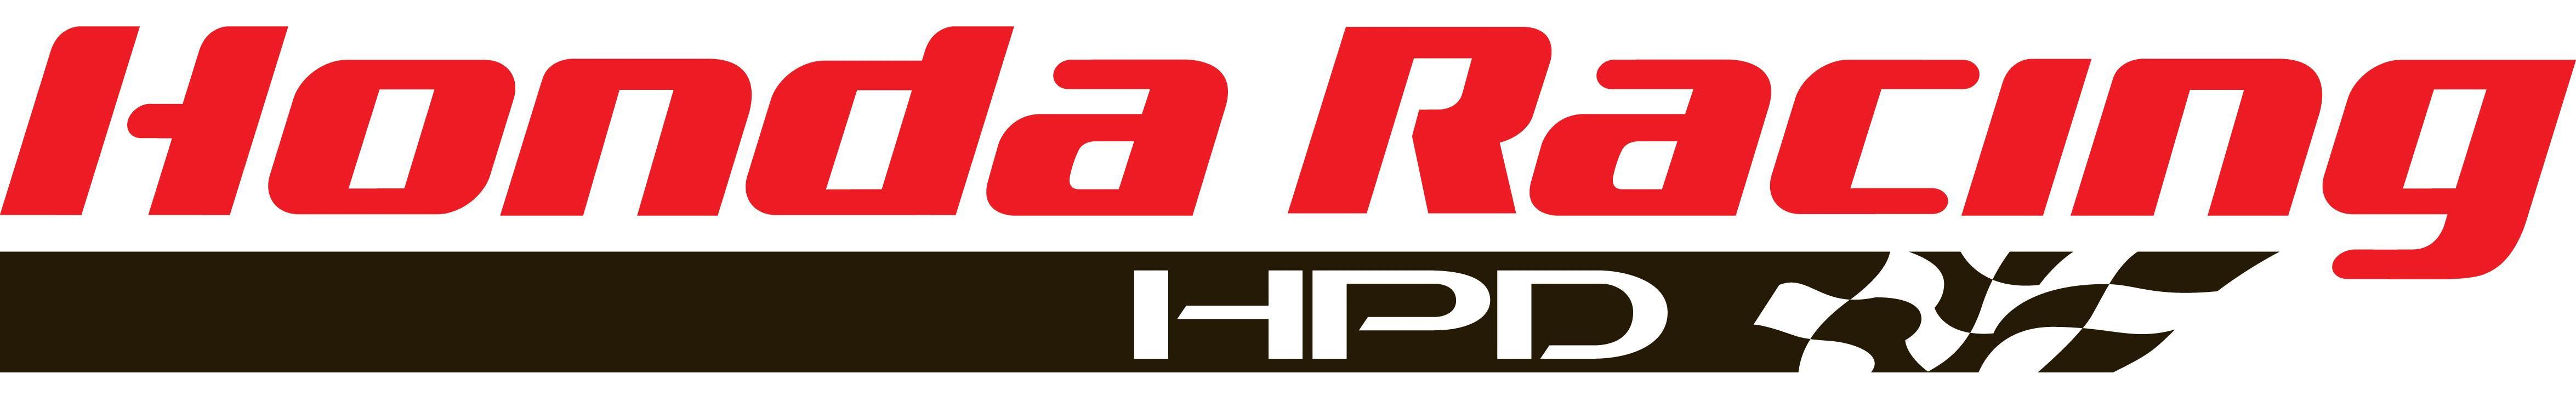 honda racing logos rh logolynx com honda racing logo svg honda racing logo svg